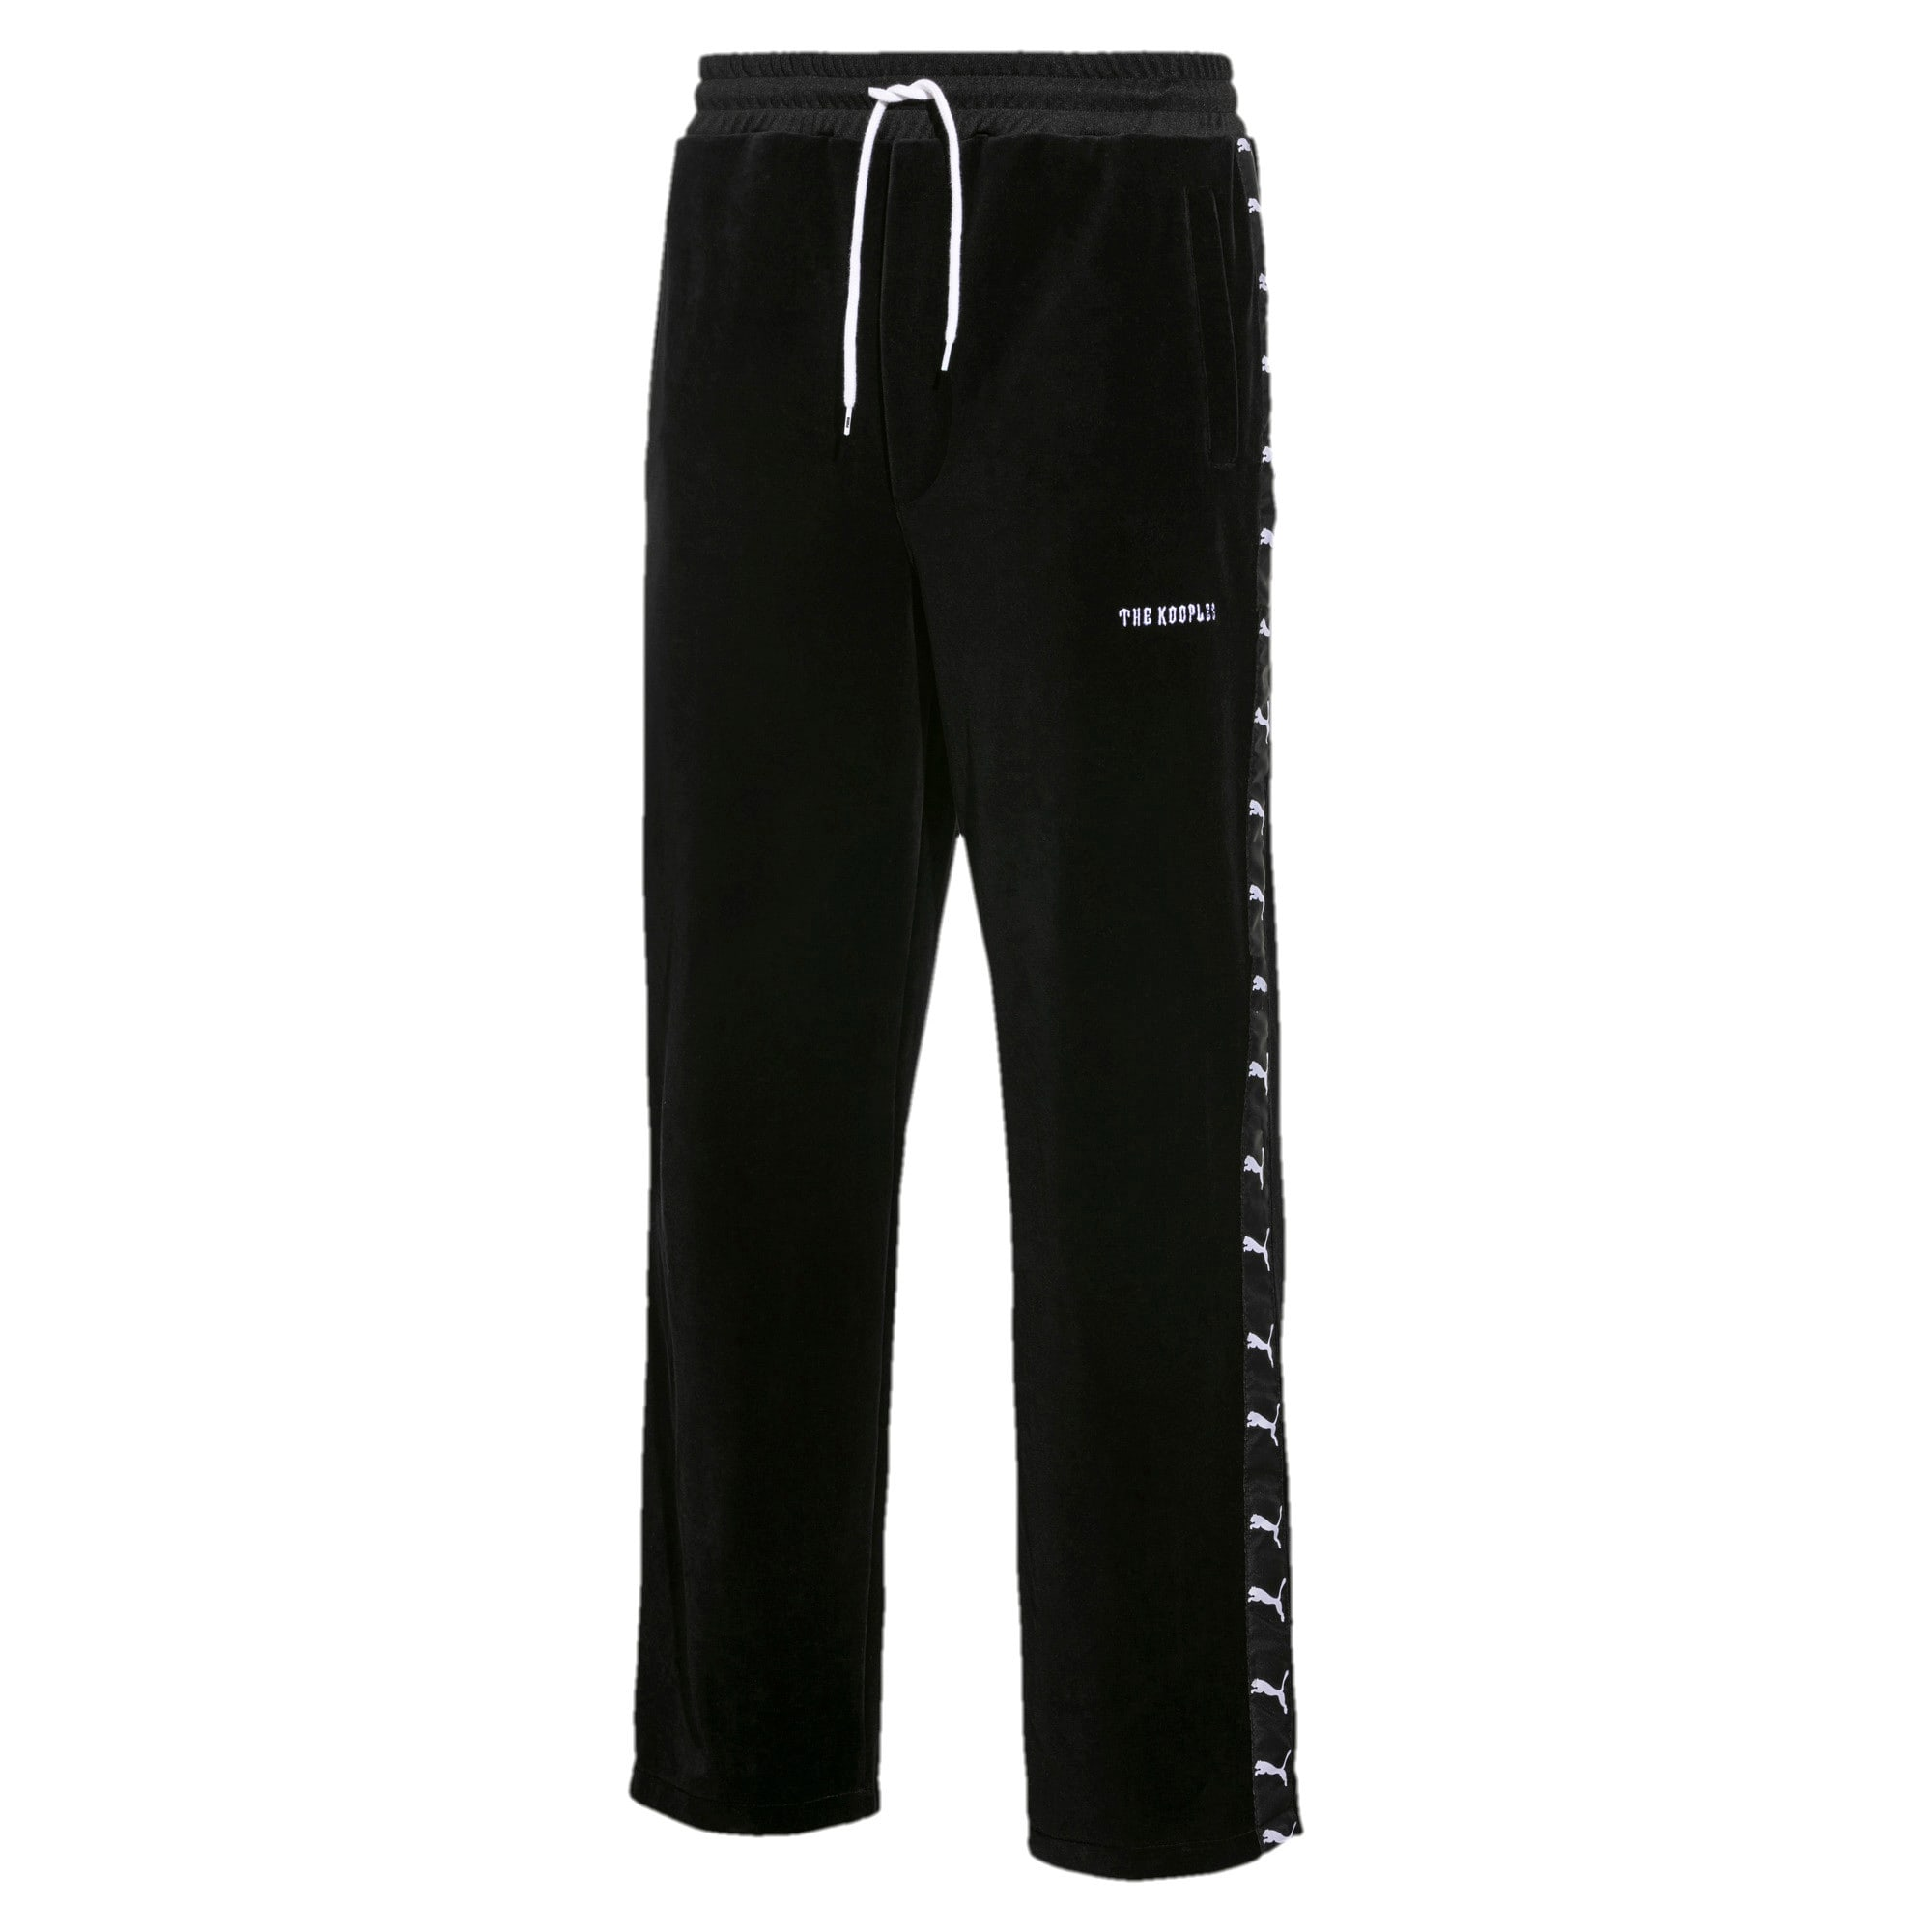 Thumbnail 1 of PUMA x THE KOOPLES Men's Velour Track Pants, Puma Black, medium